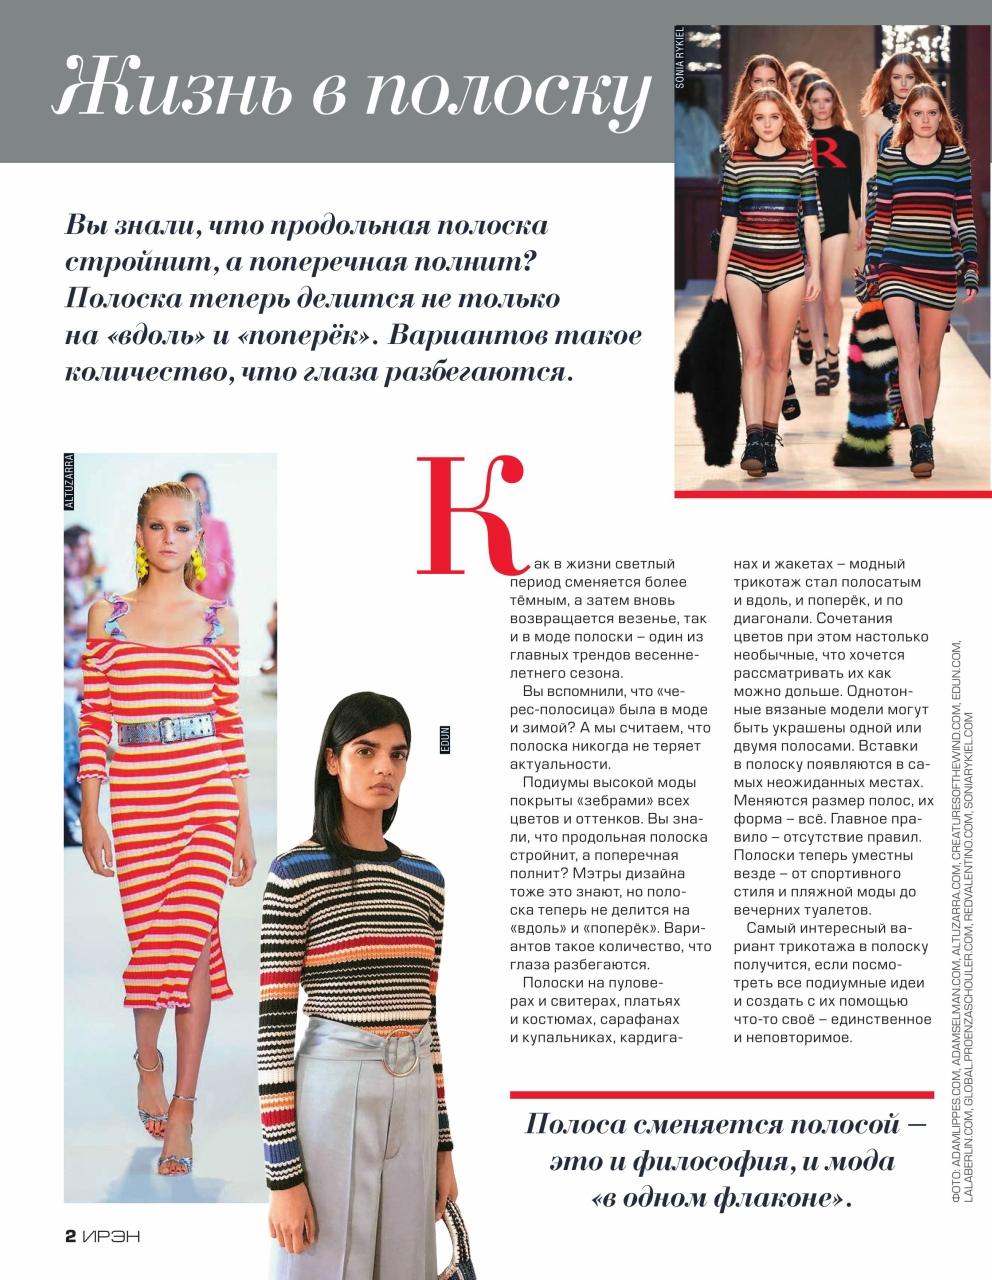 Журнал «Ирэн» №4 2017 (5)